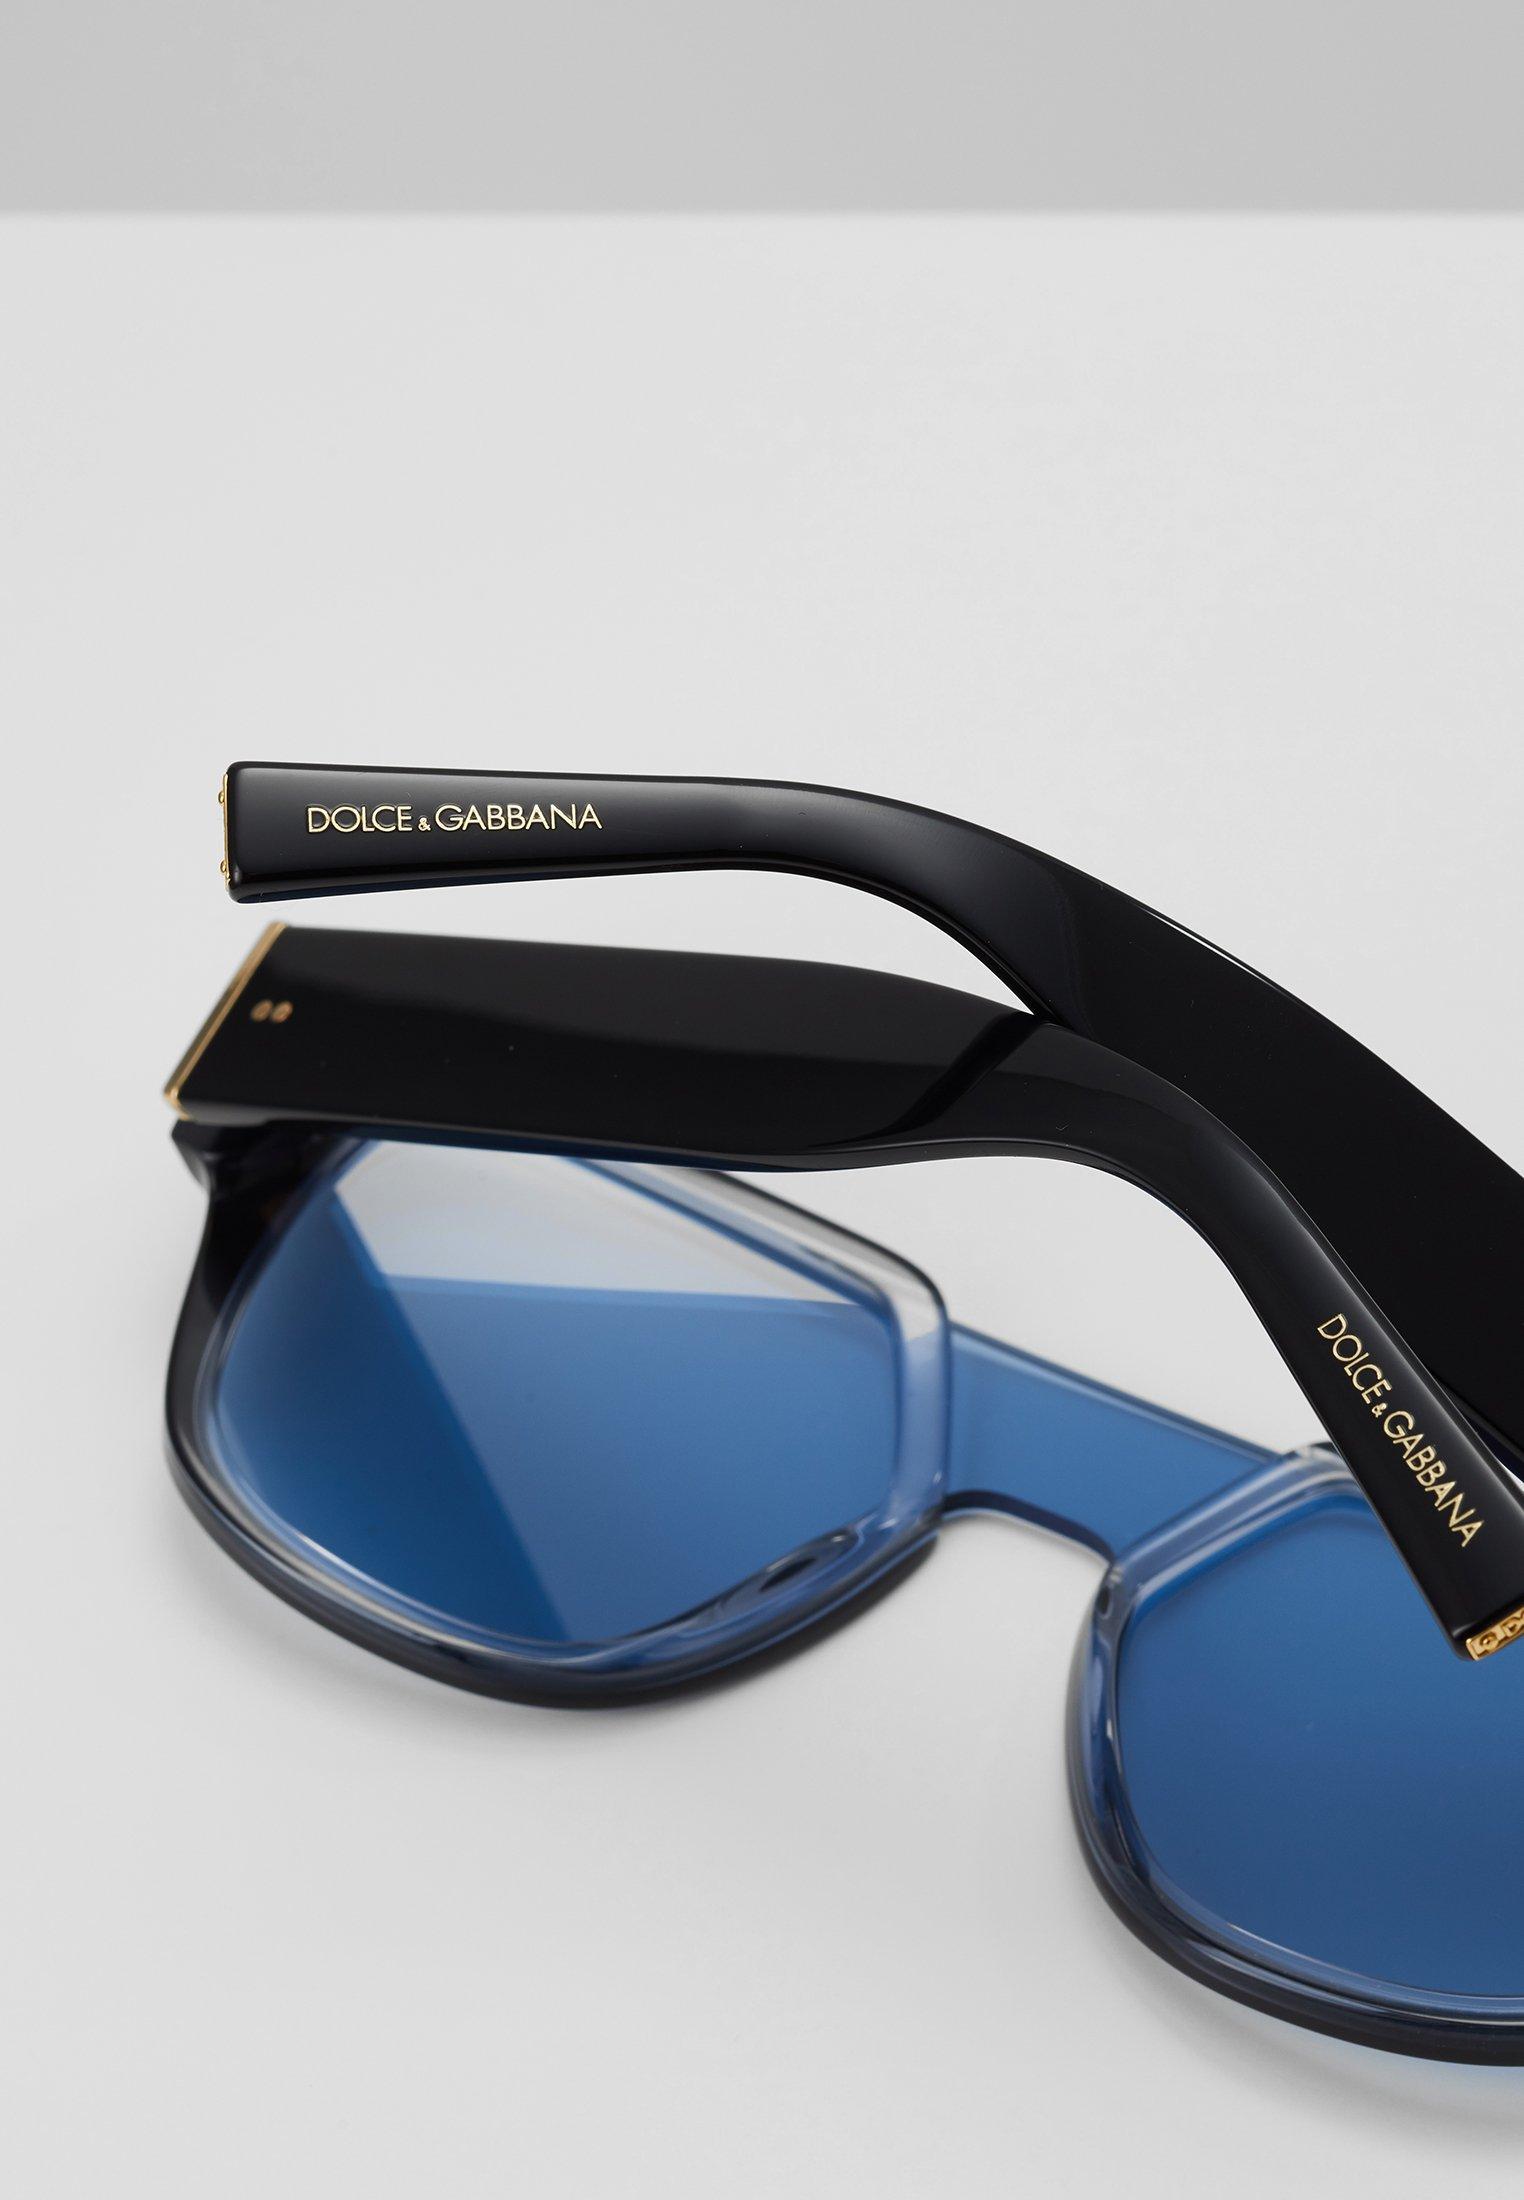 DolceGabbana Sonnenbrille - black/transparent azure/light blue/dunkelblau - Herrenaccessoires MgJsE